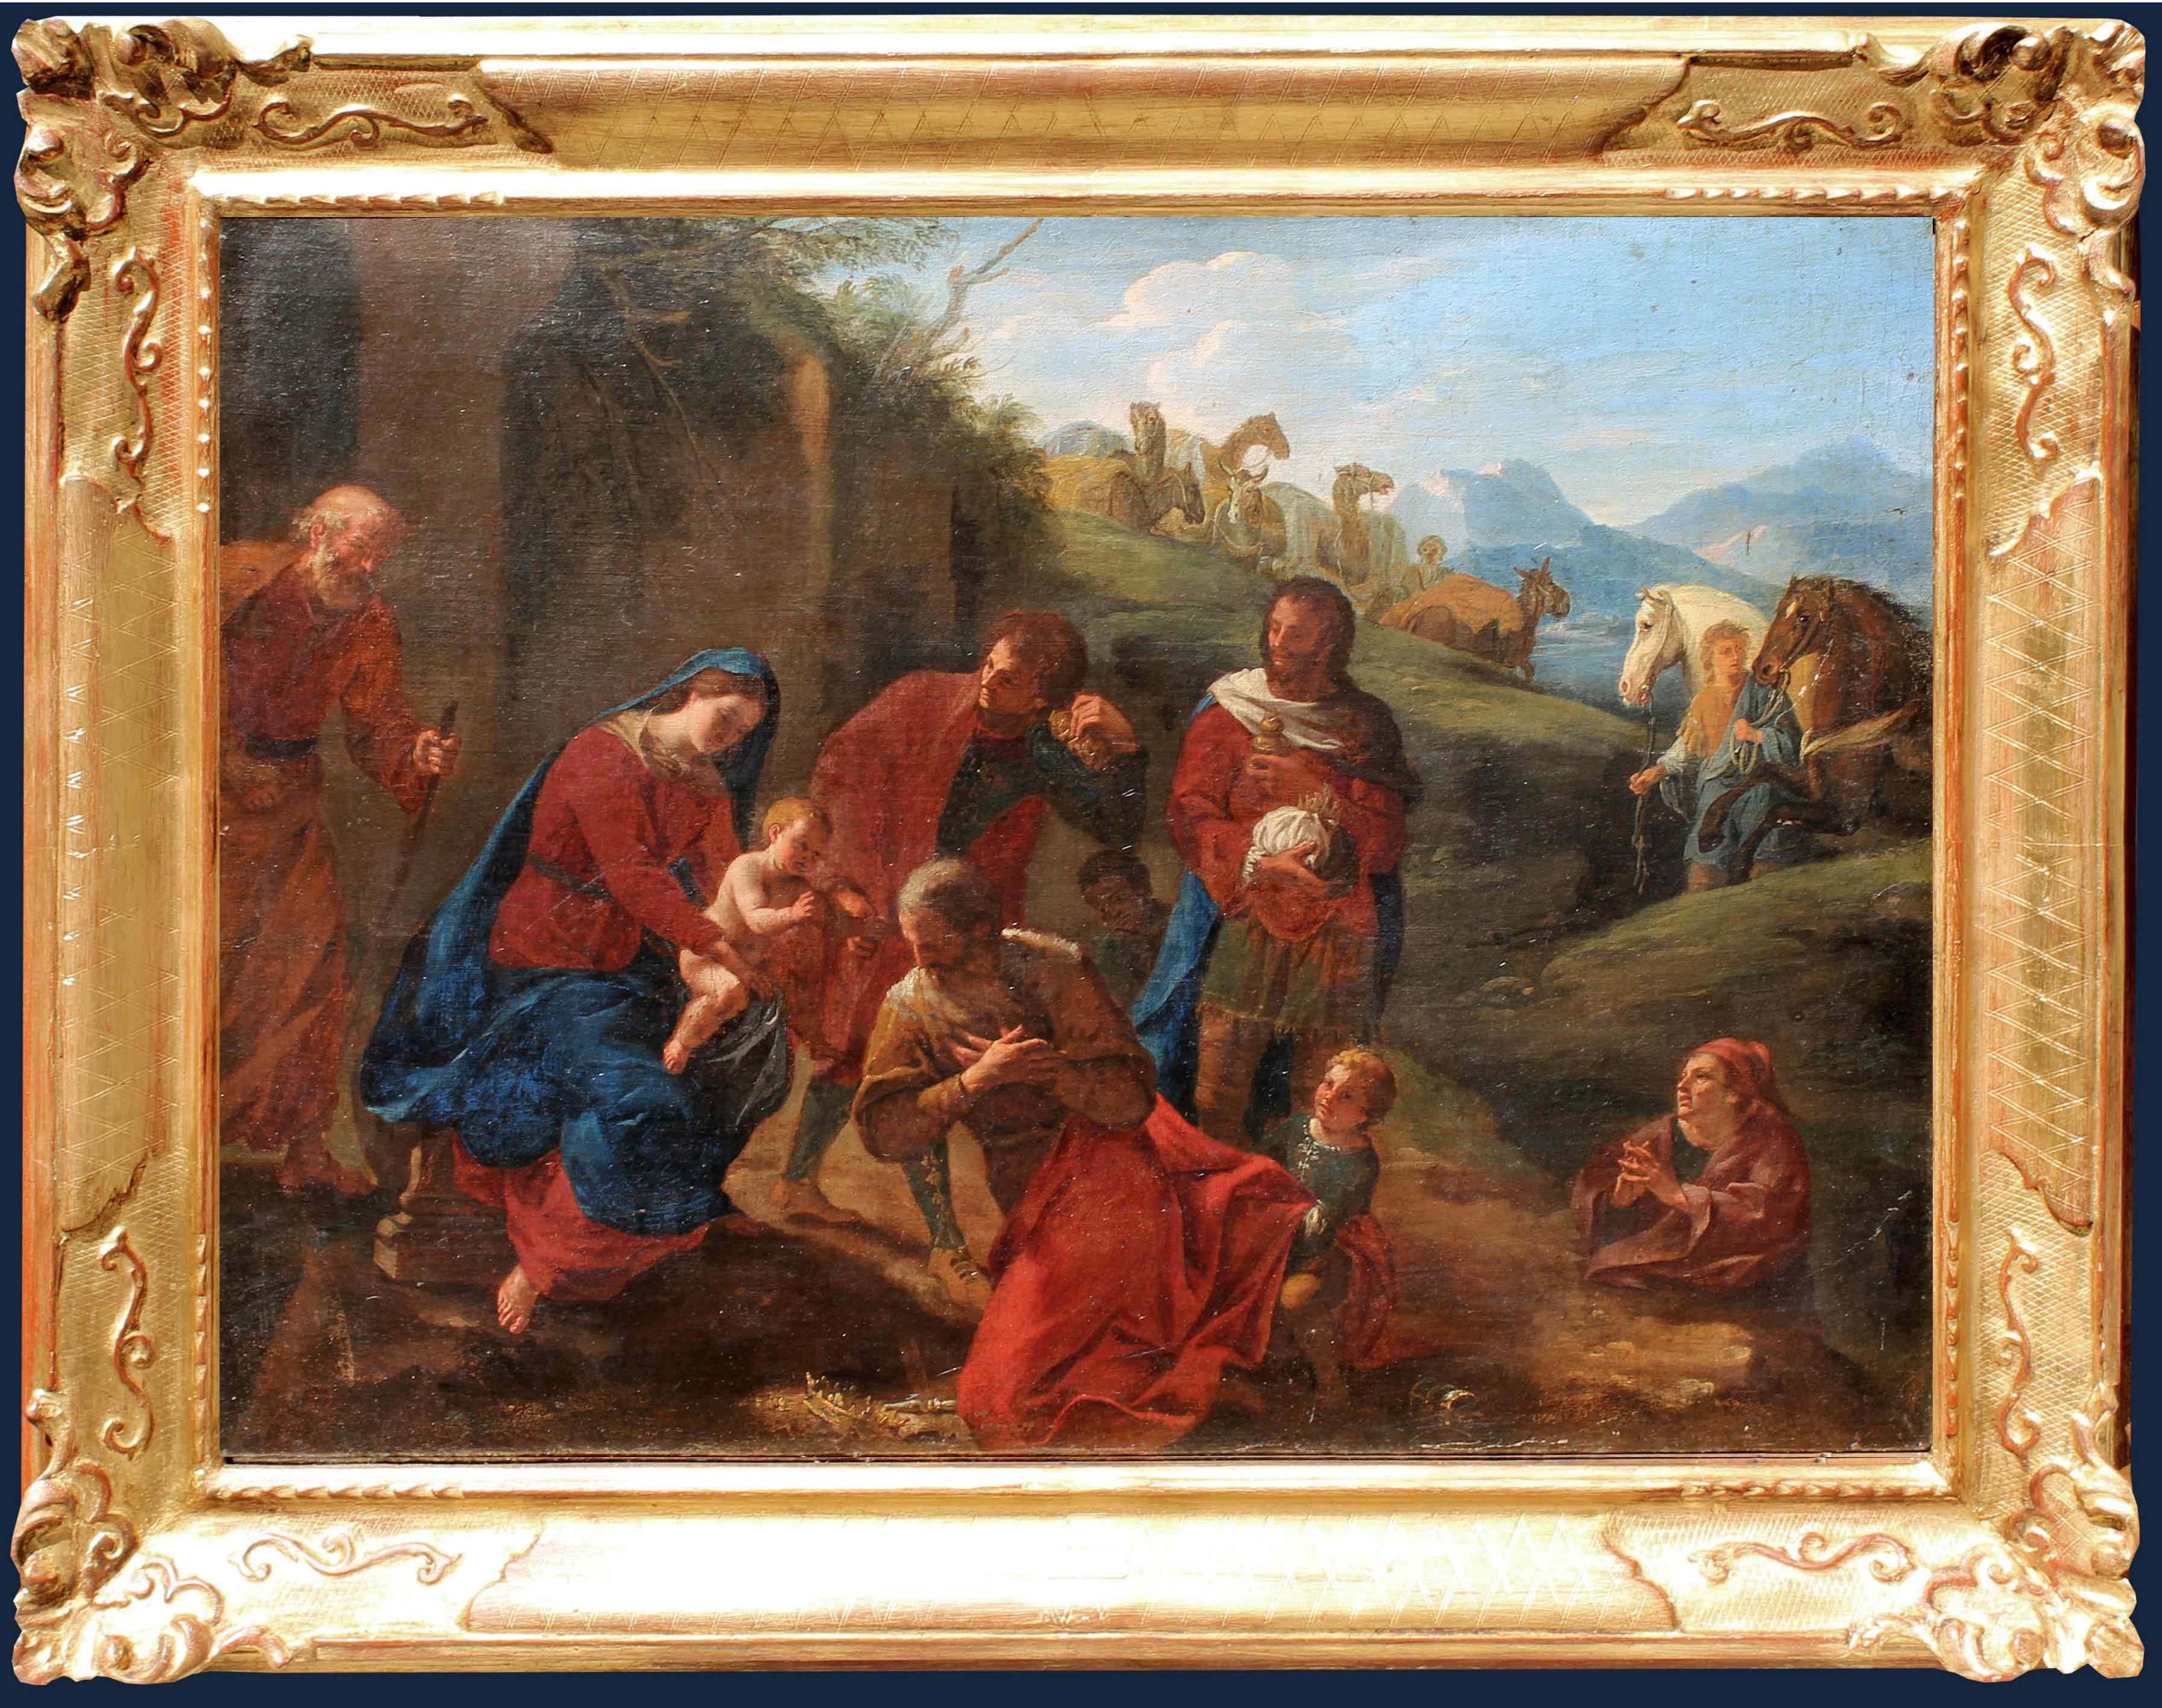 Giovan Battista Mollo (1613-1661), Adoration of the Magi